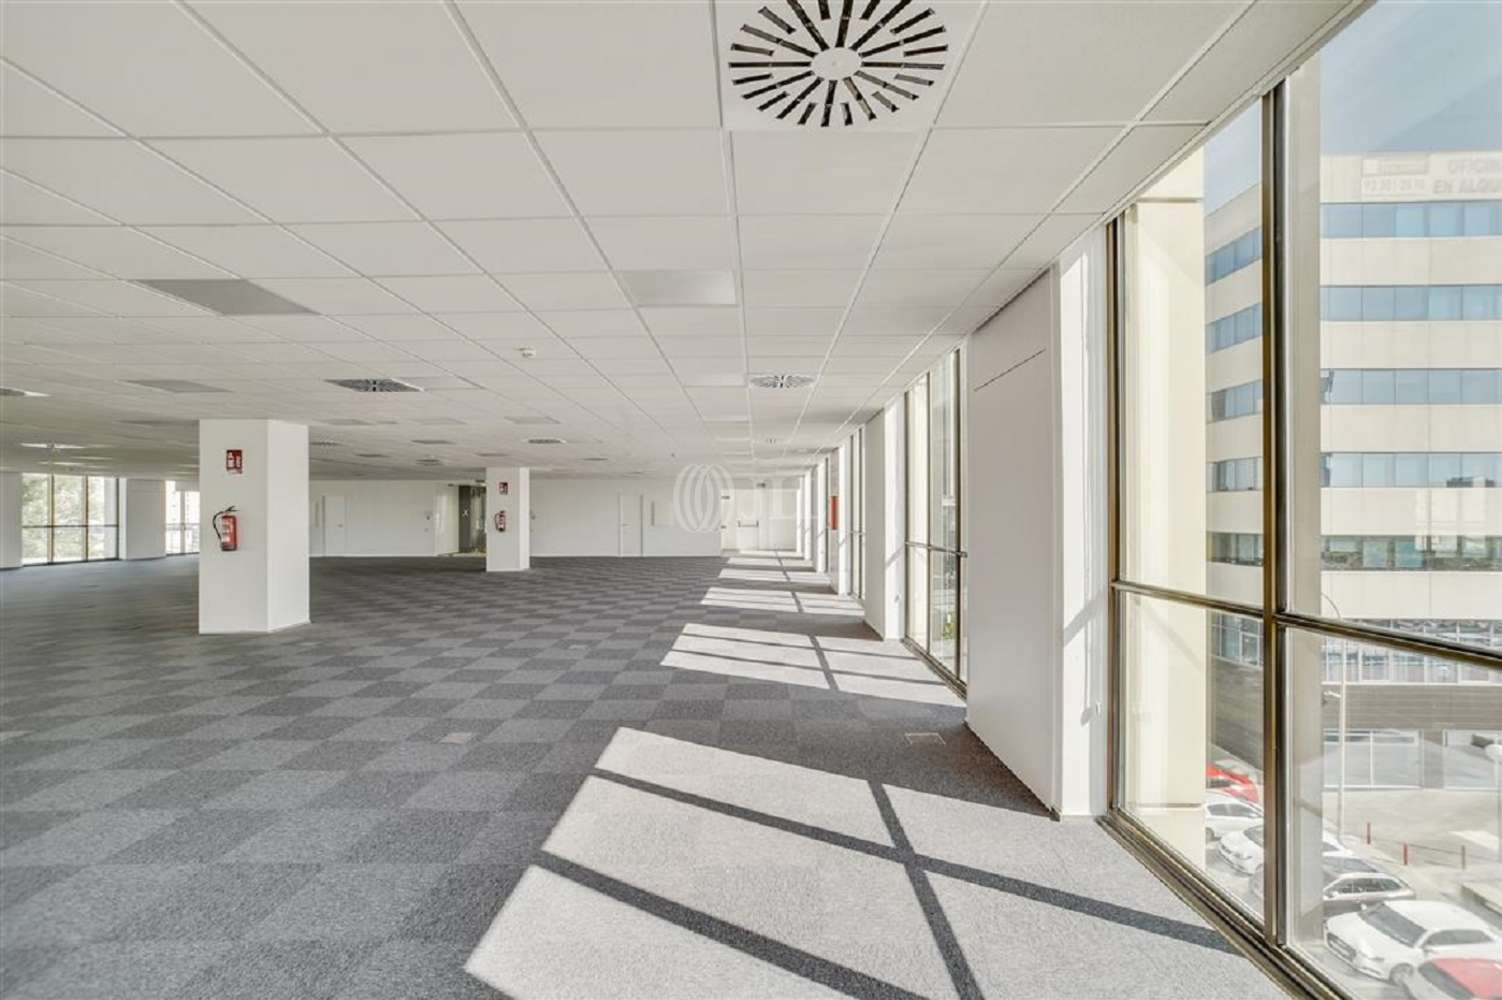 Oficina Sant just desvern, 08960 - DIAGONAL SANT JUST - Edificio A